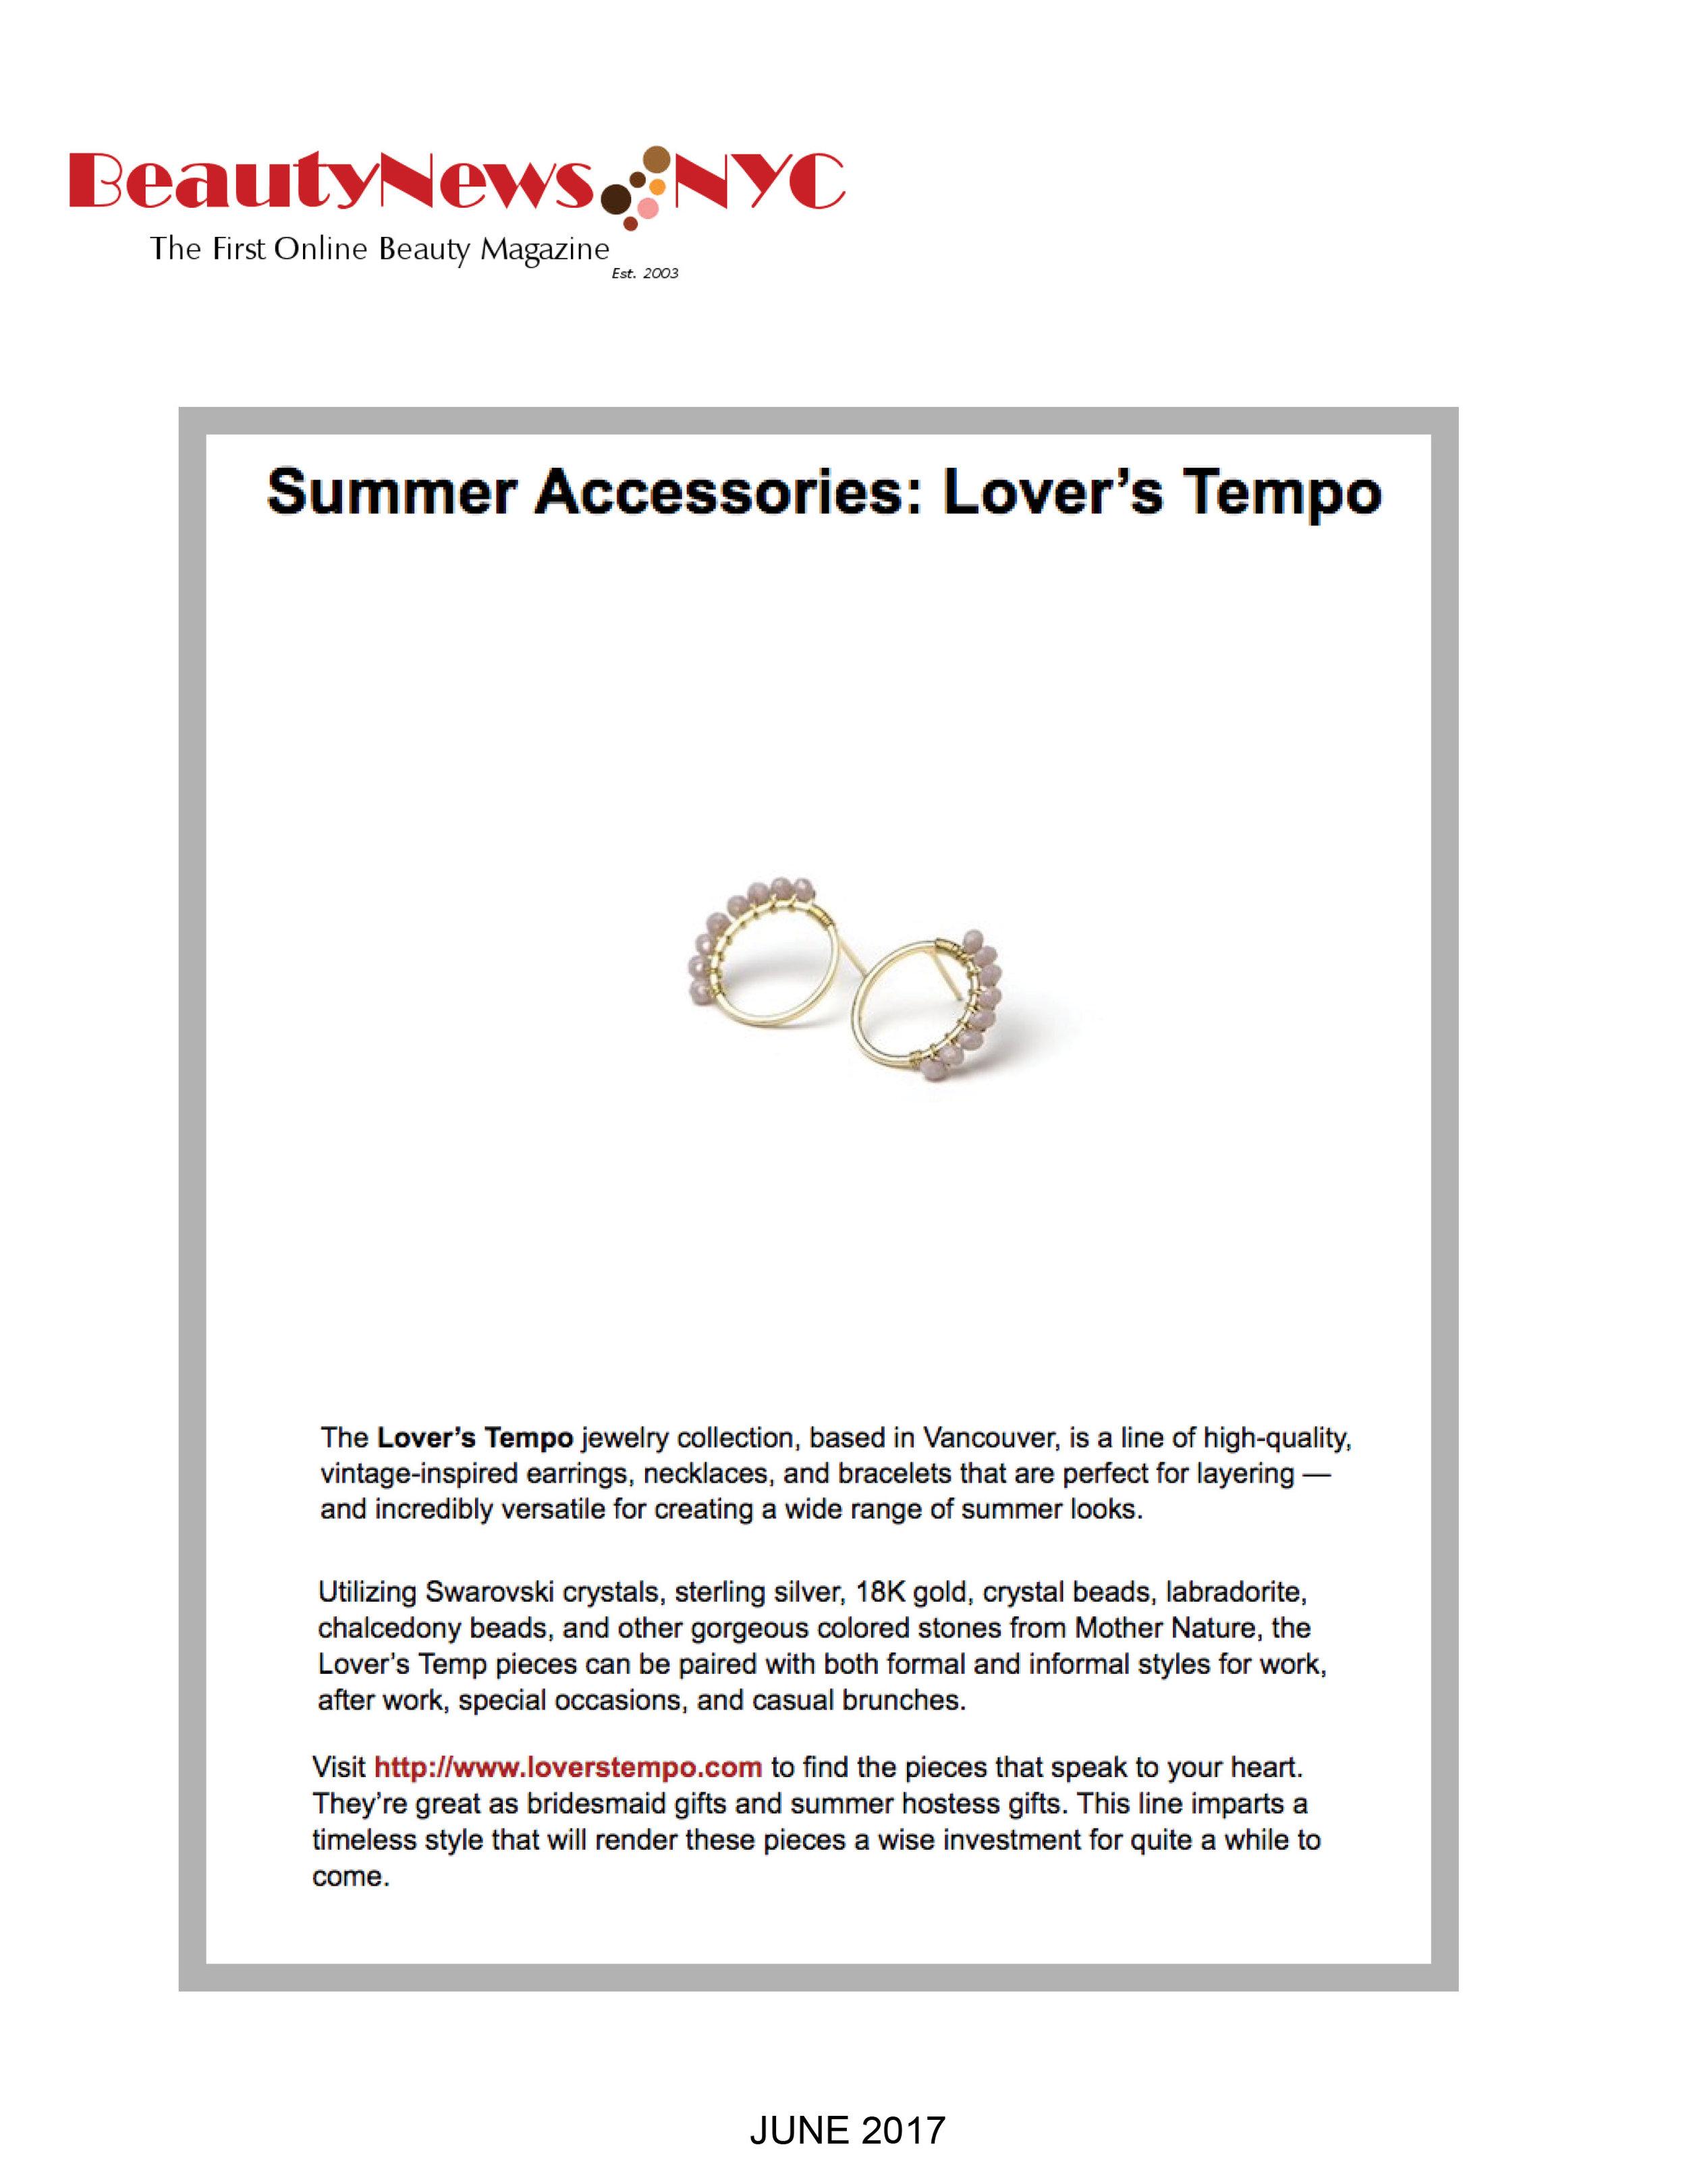 LoversTempo_BeautyNewsNYC_June2017.jpg